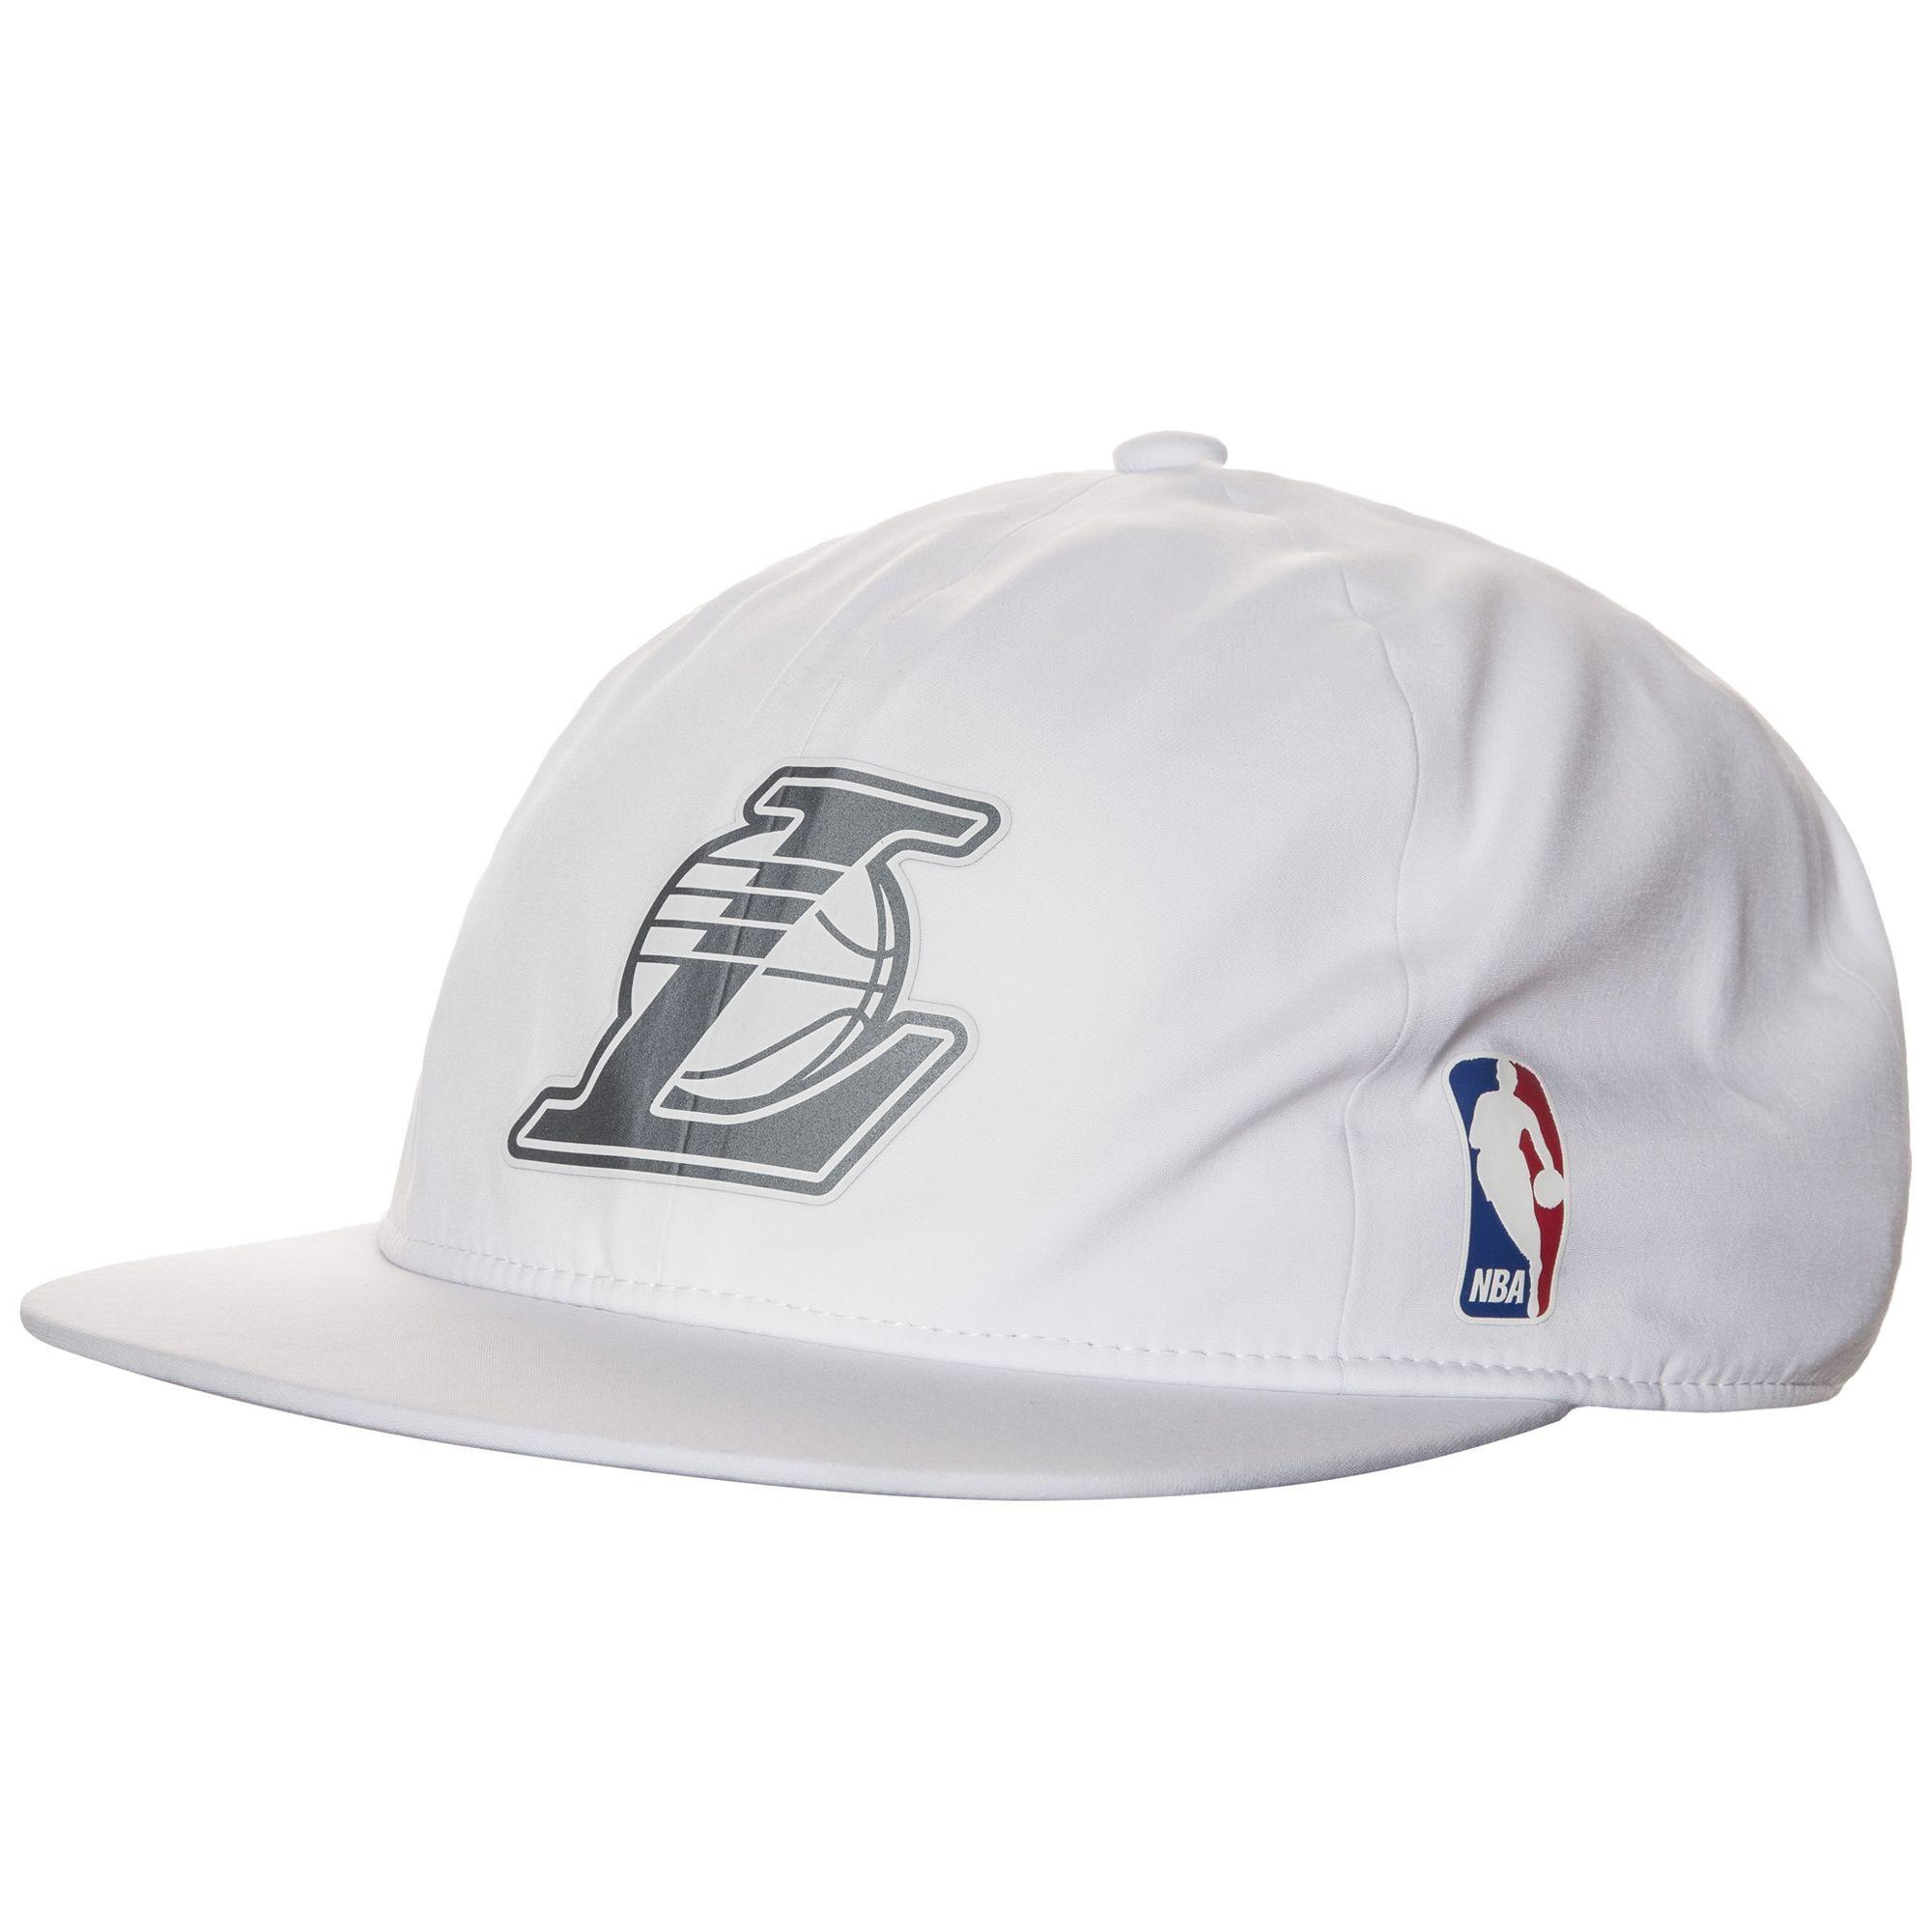 ADIDAS PERFORMANCE adidas Performance NBA Lakers Cap Herren